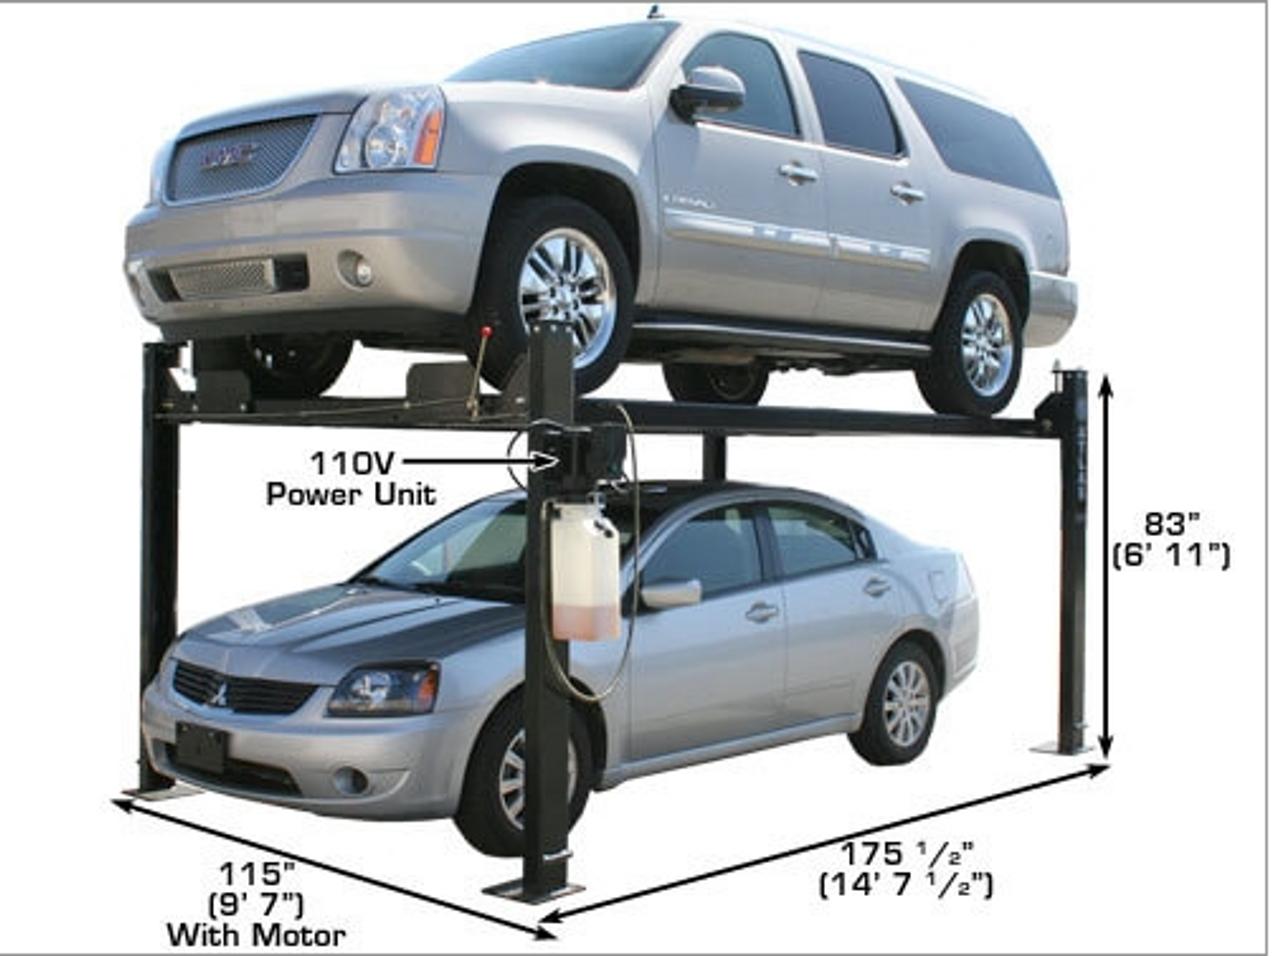 Atlas® Automotive Equipment Garage Pro 8000 4 Post Lift 8,000 lbs